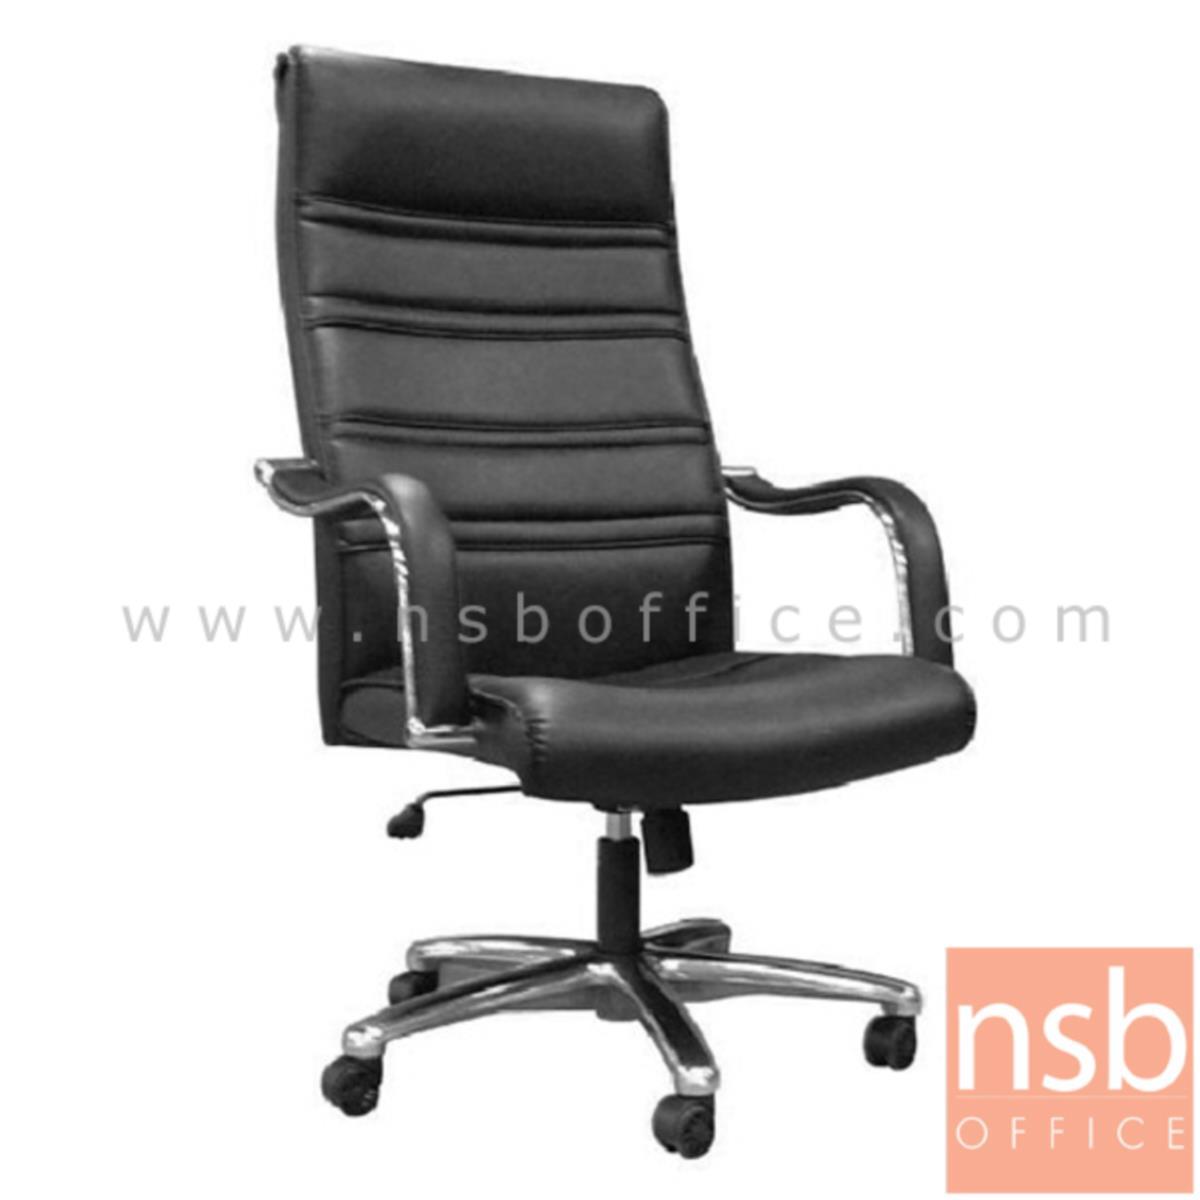 B01A543:เก้าอี้สำนักงาน รุ่น Caden (เคเดน)  ขาอลูมิเนียม โช๊คแก๊ส ก้อนโยก